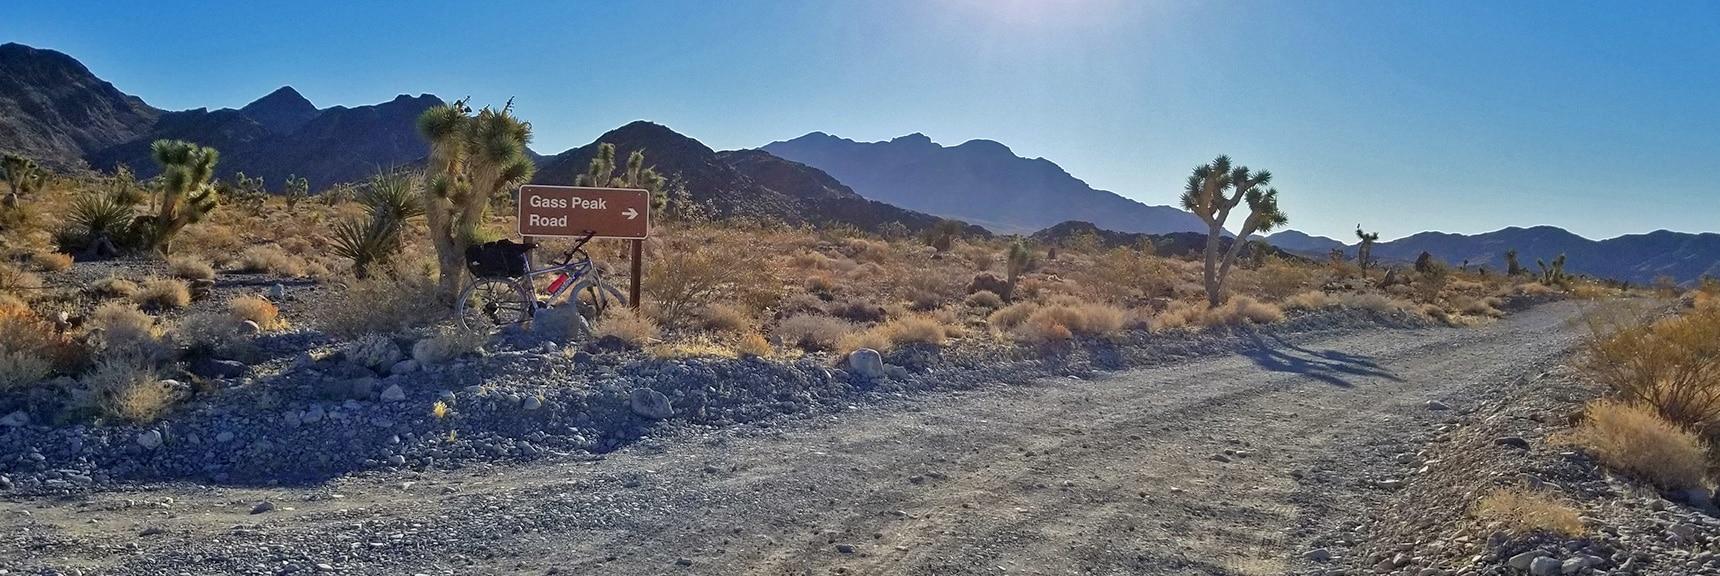 View Down Gass Peak Road, Gass Peak in Background | Lower Mormon Well Road | Sheep Range, Desert National Wildlife Refuge, Nevada